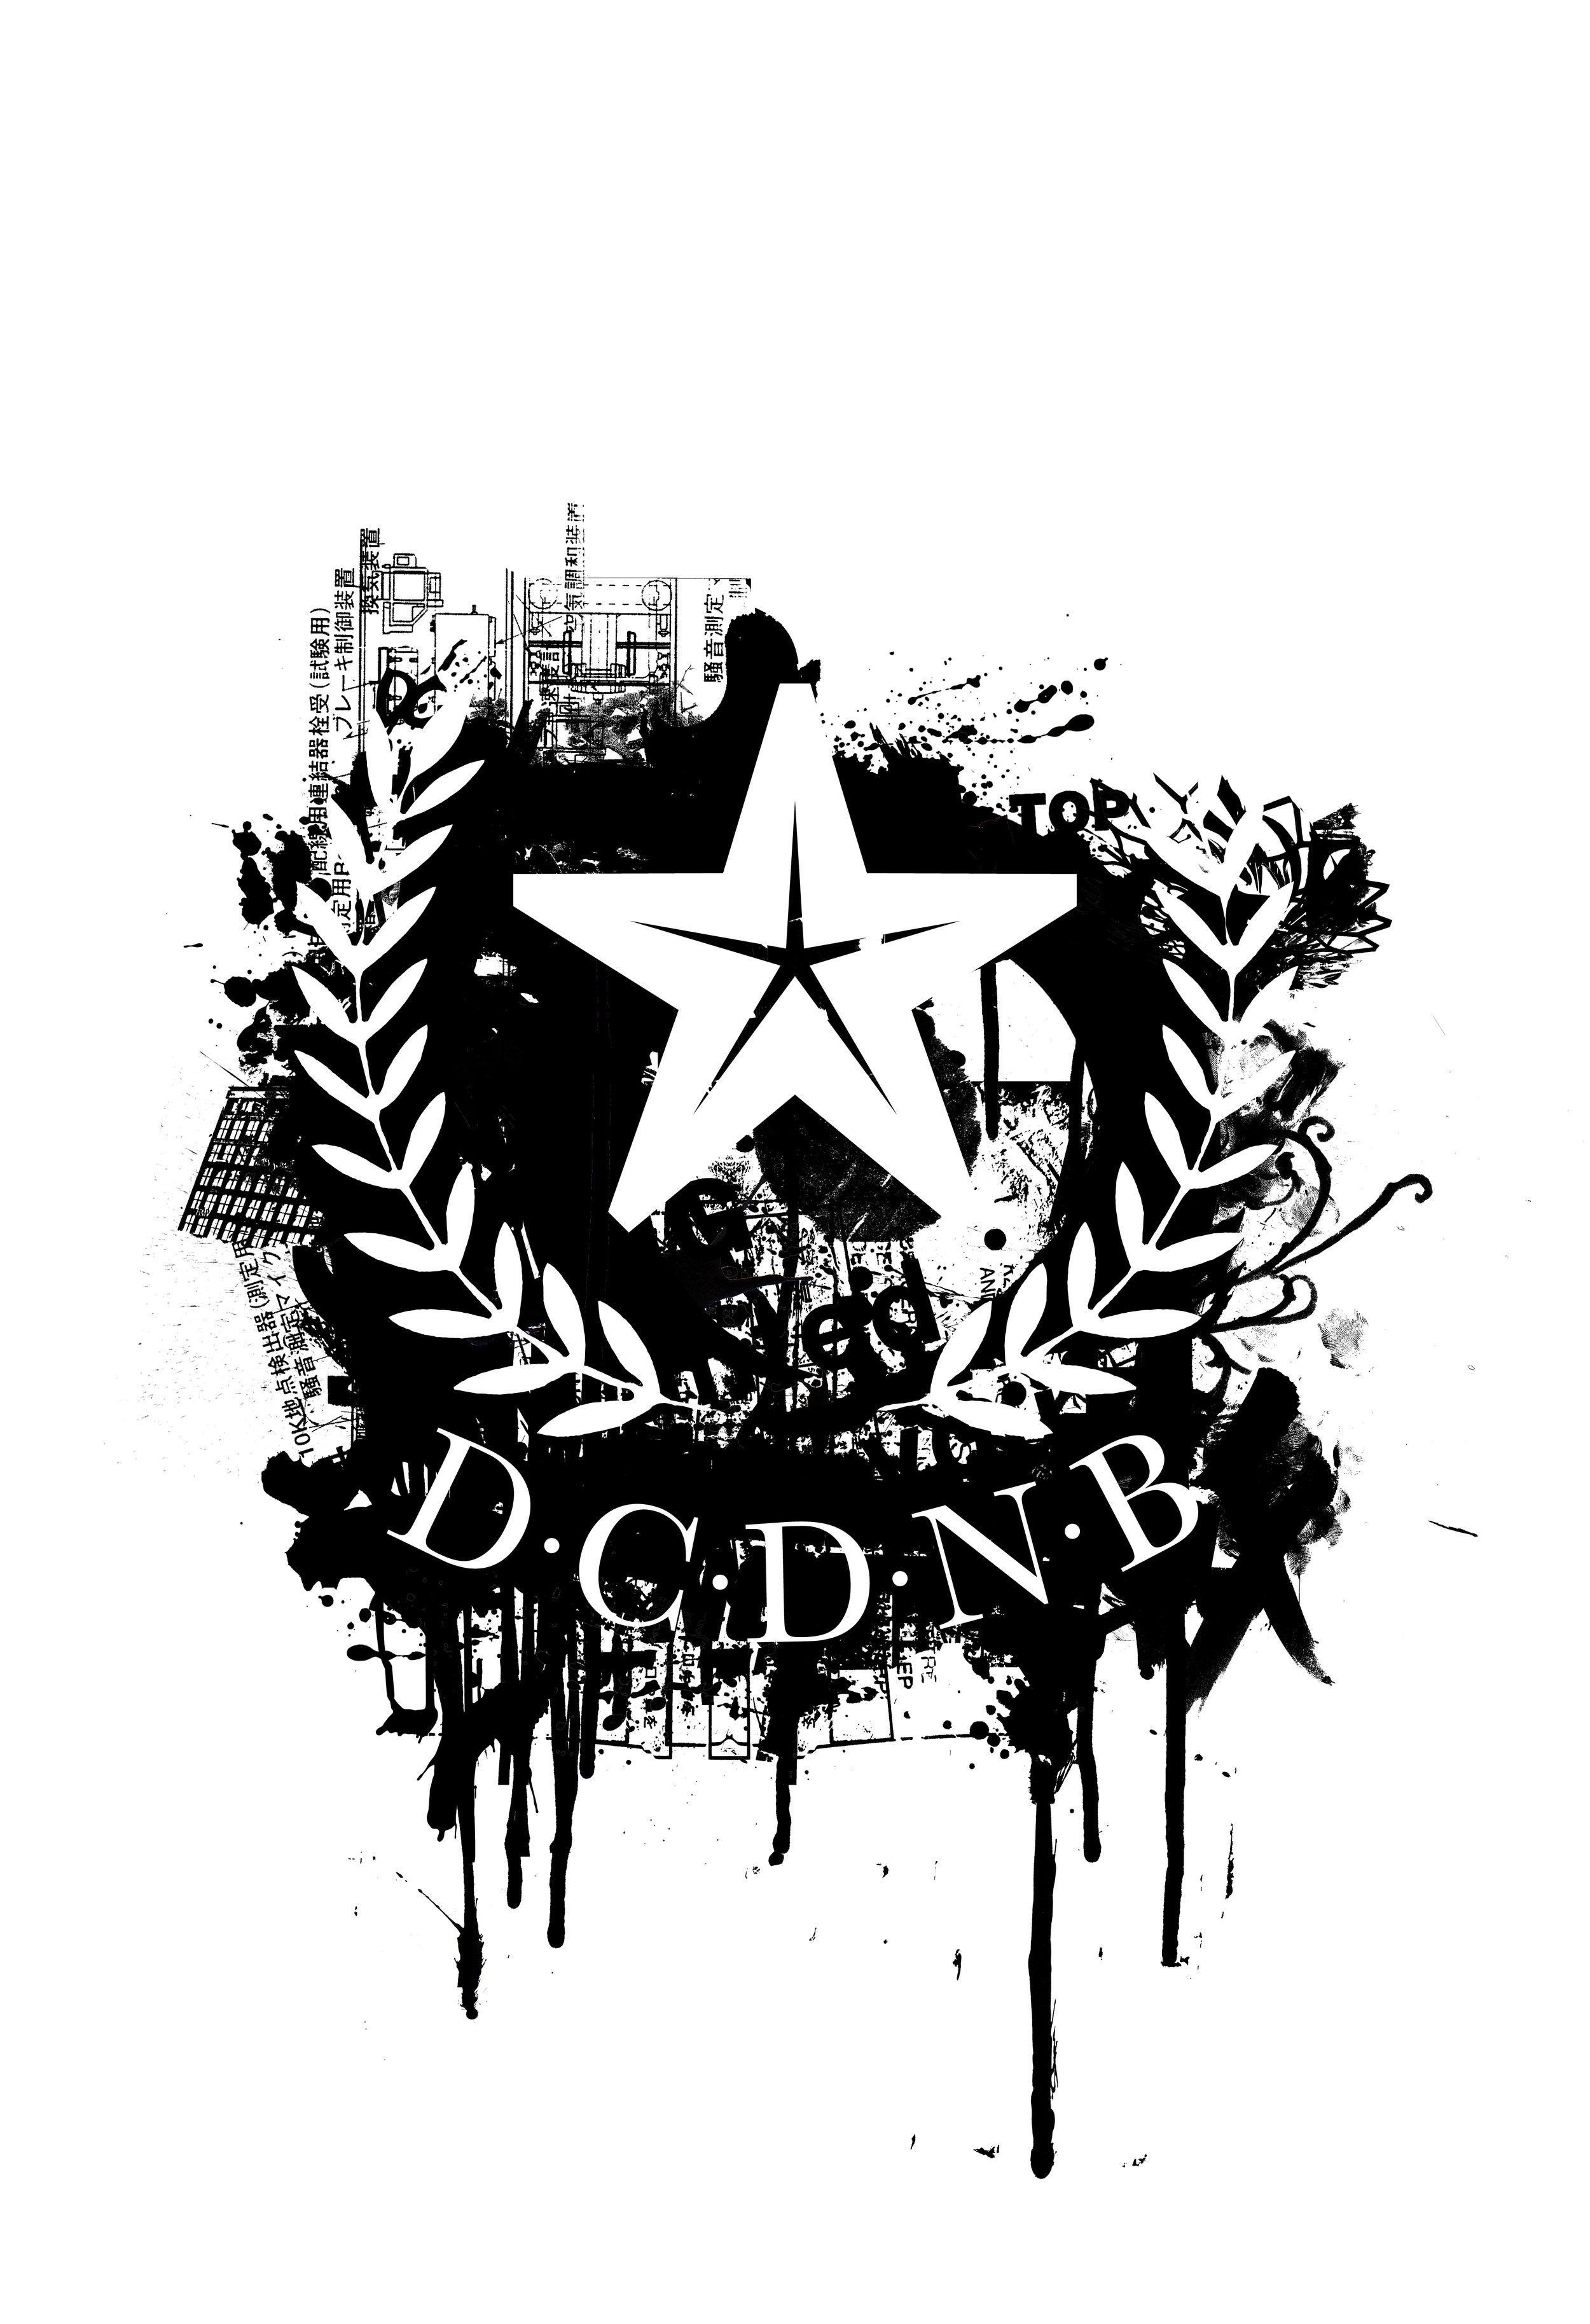 DCDNB_2007_dcdnb_remix- v 2007.jpg